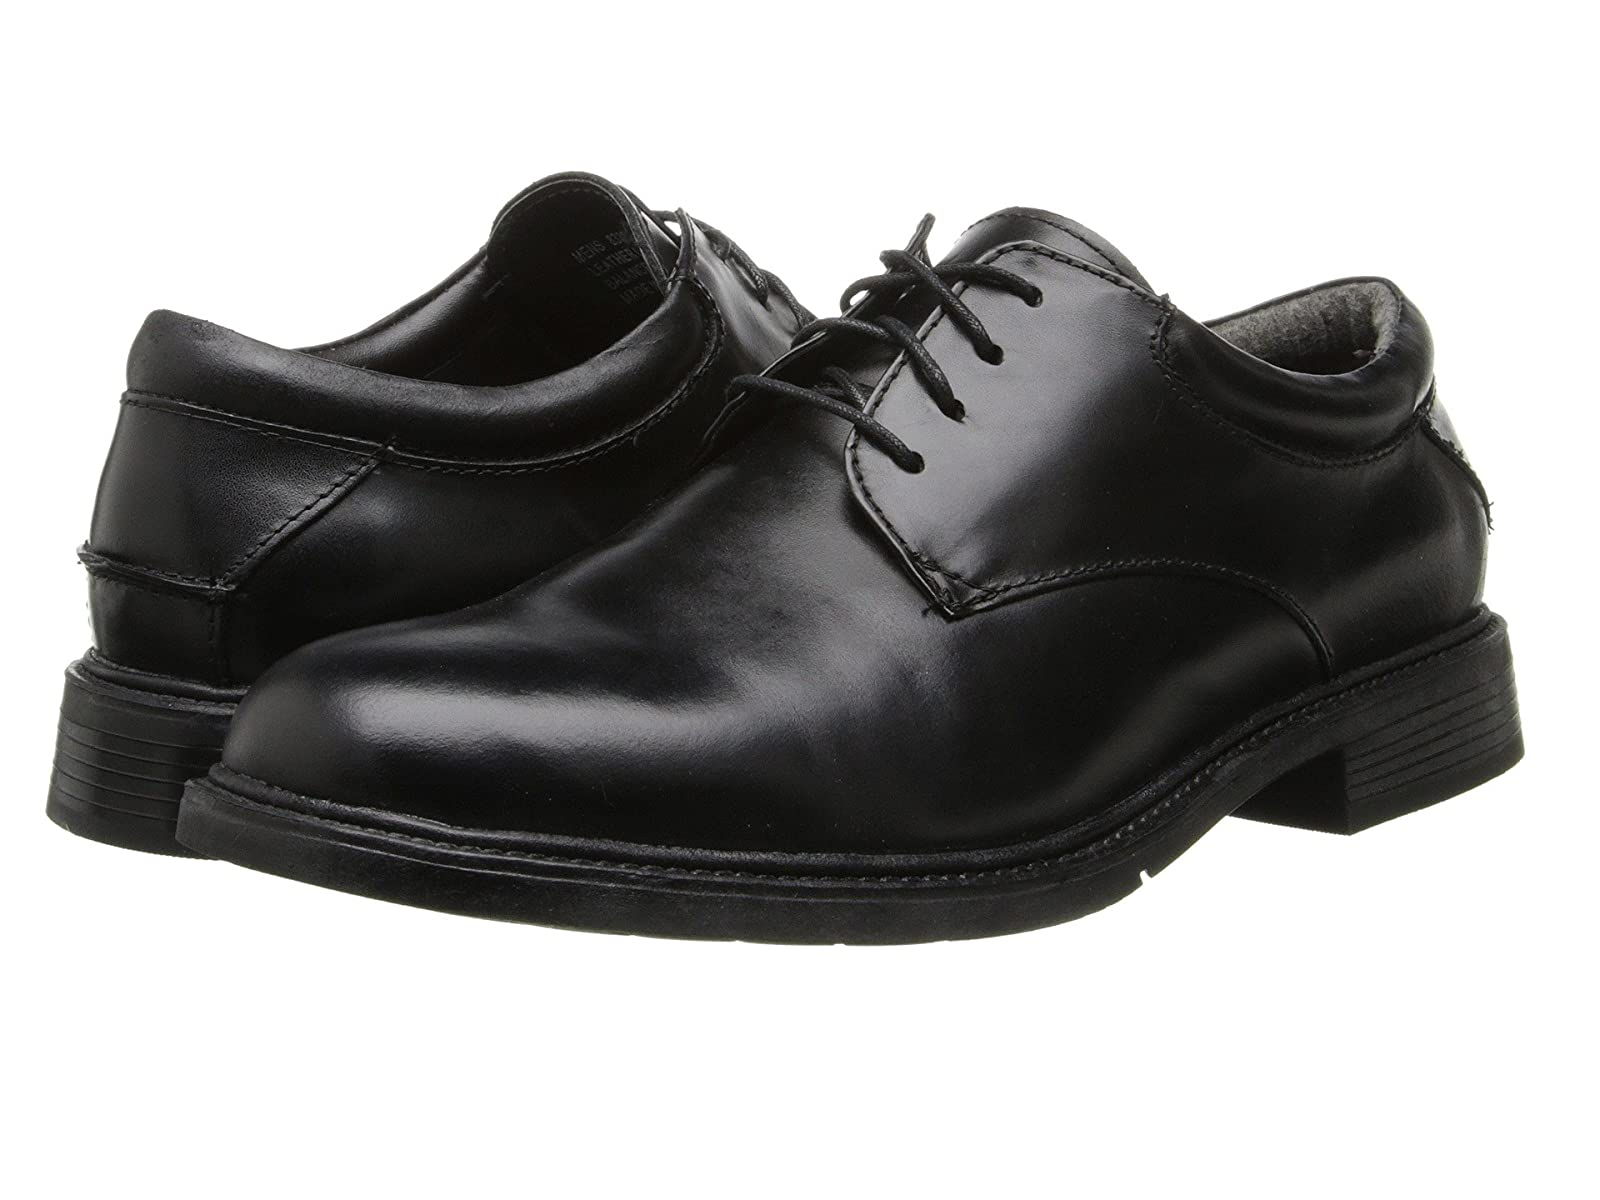 Nunn Bush Maury Plain Toe Oxford Lace-UpAtmospheric grades have affordable shoes